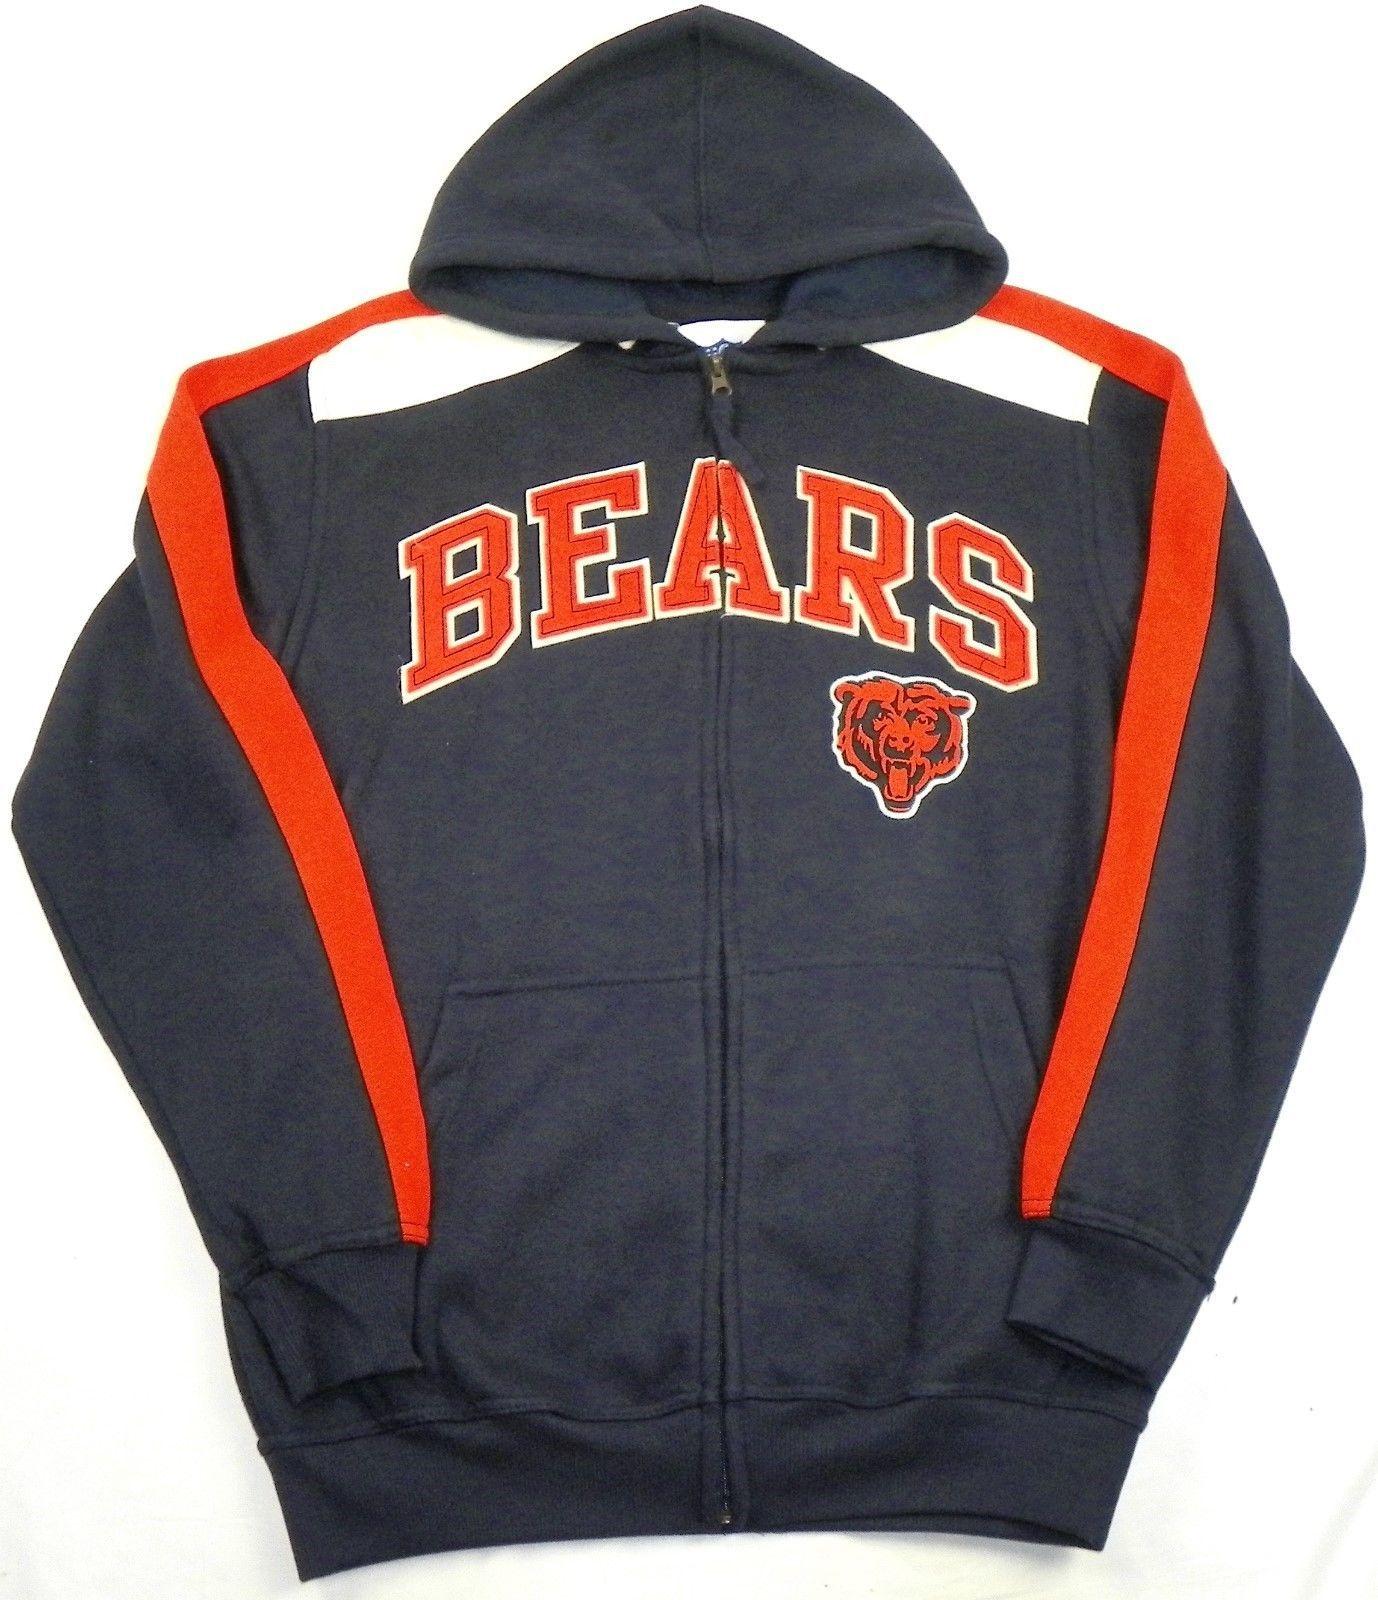 Medium Chicago Bears Hoodie Men's NFL Fan Favorite Full Zip Sweatshirt NEW